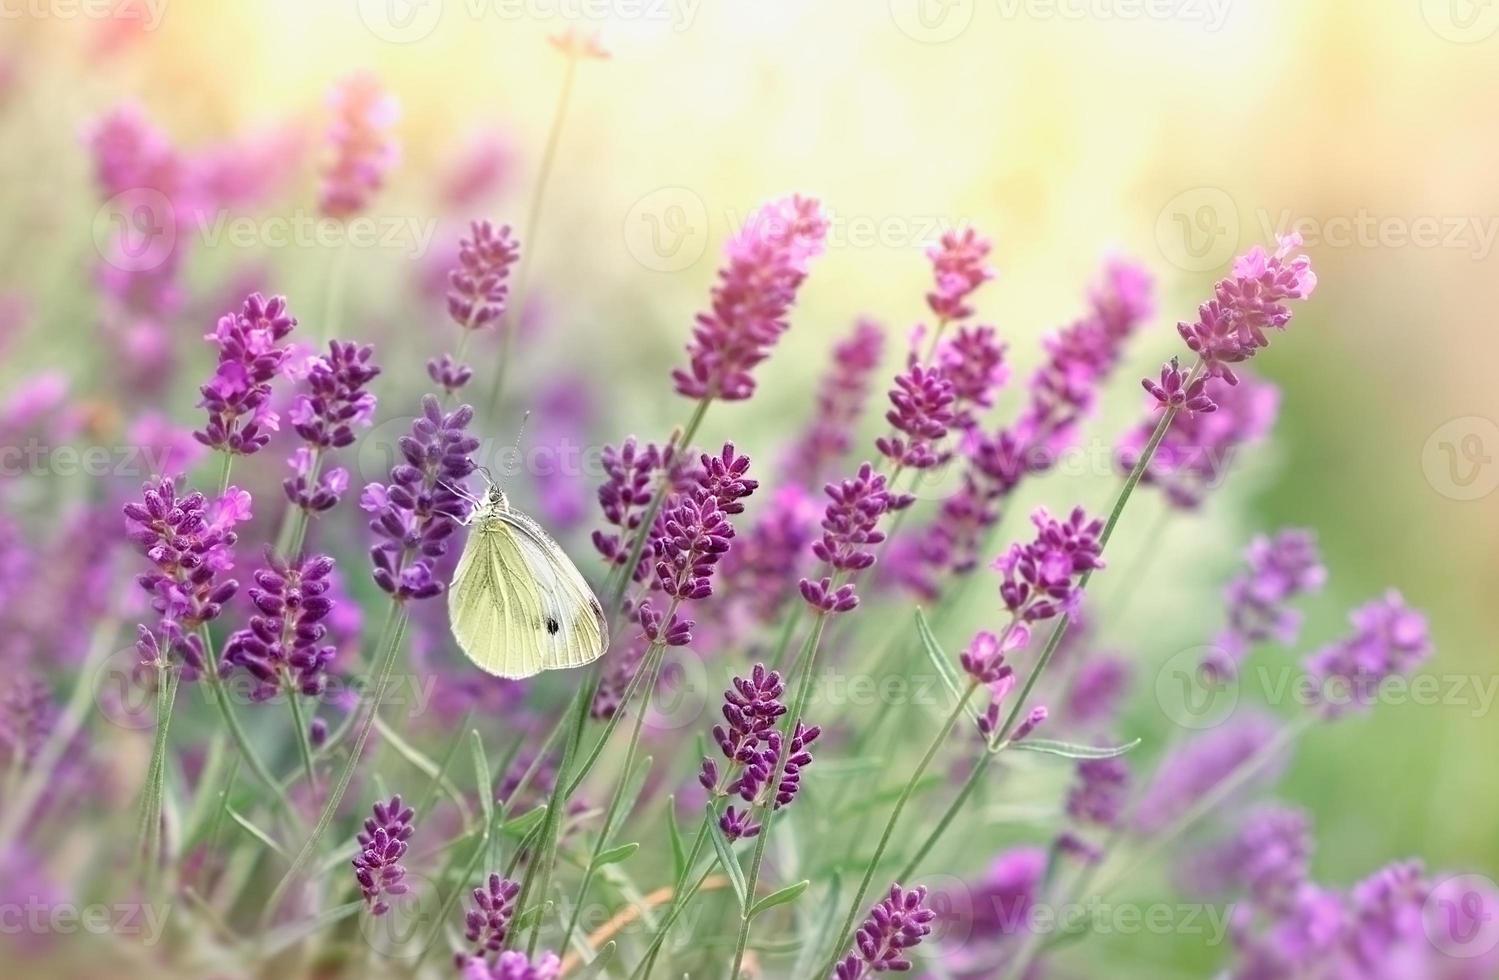 Schmetterling auf Lavendelblume foto